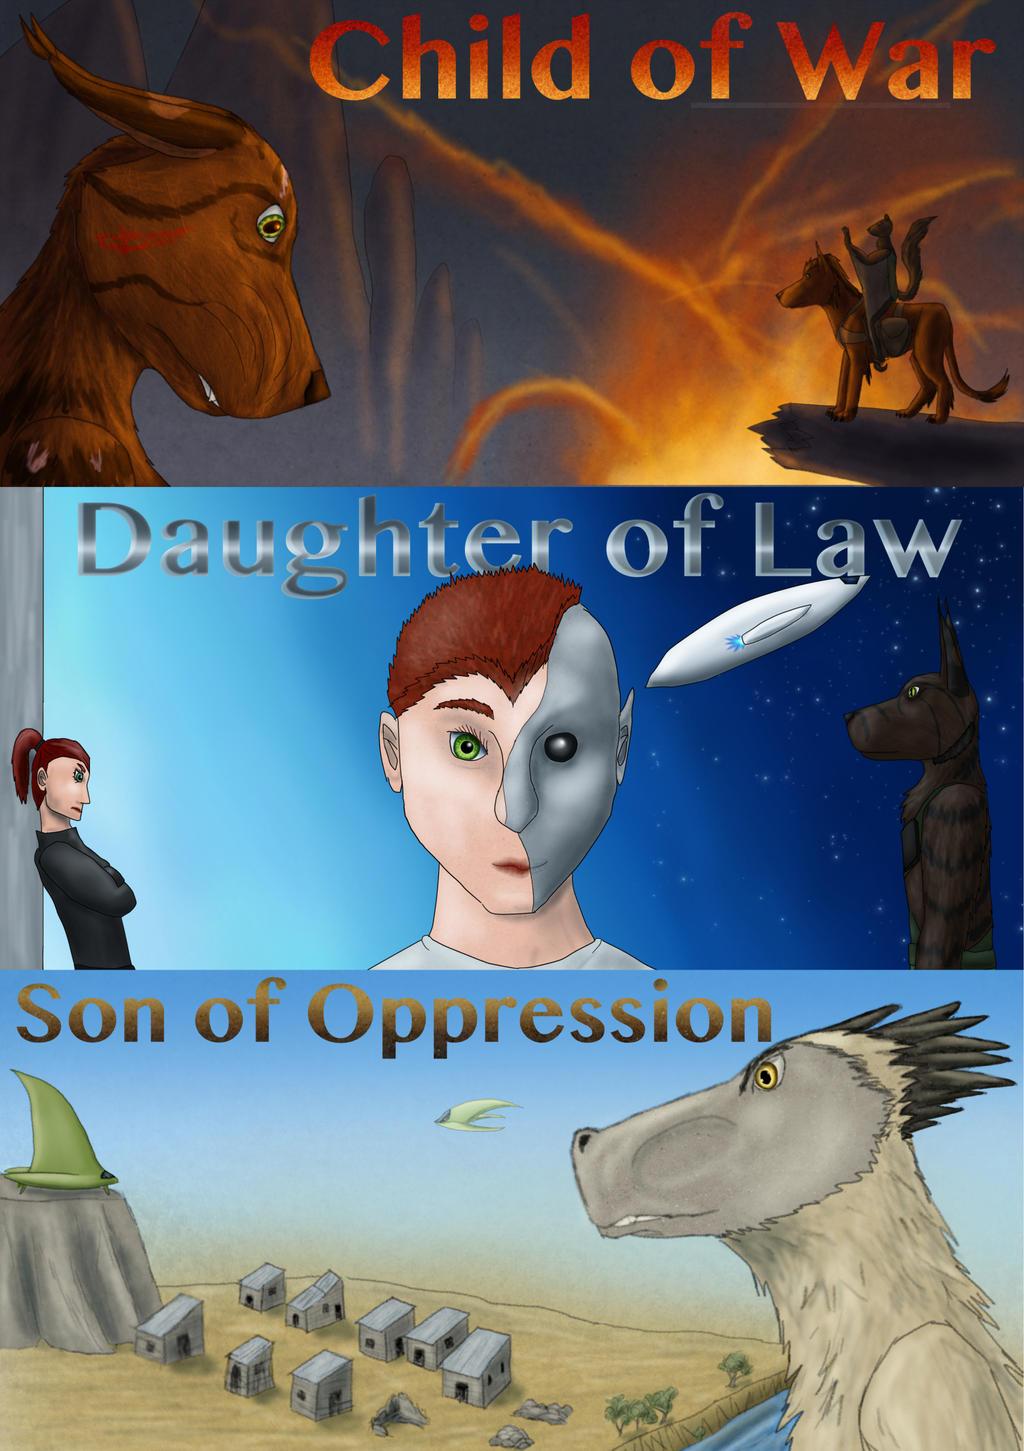 War, Law, Occupation by Rebel-Rider